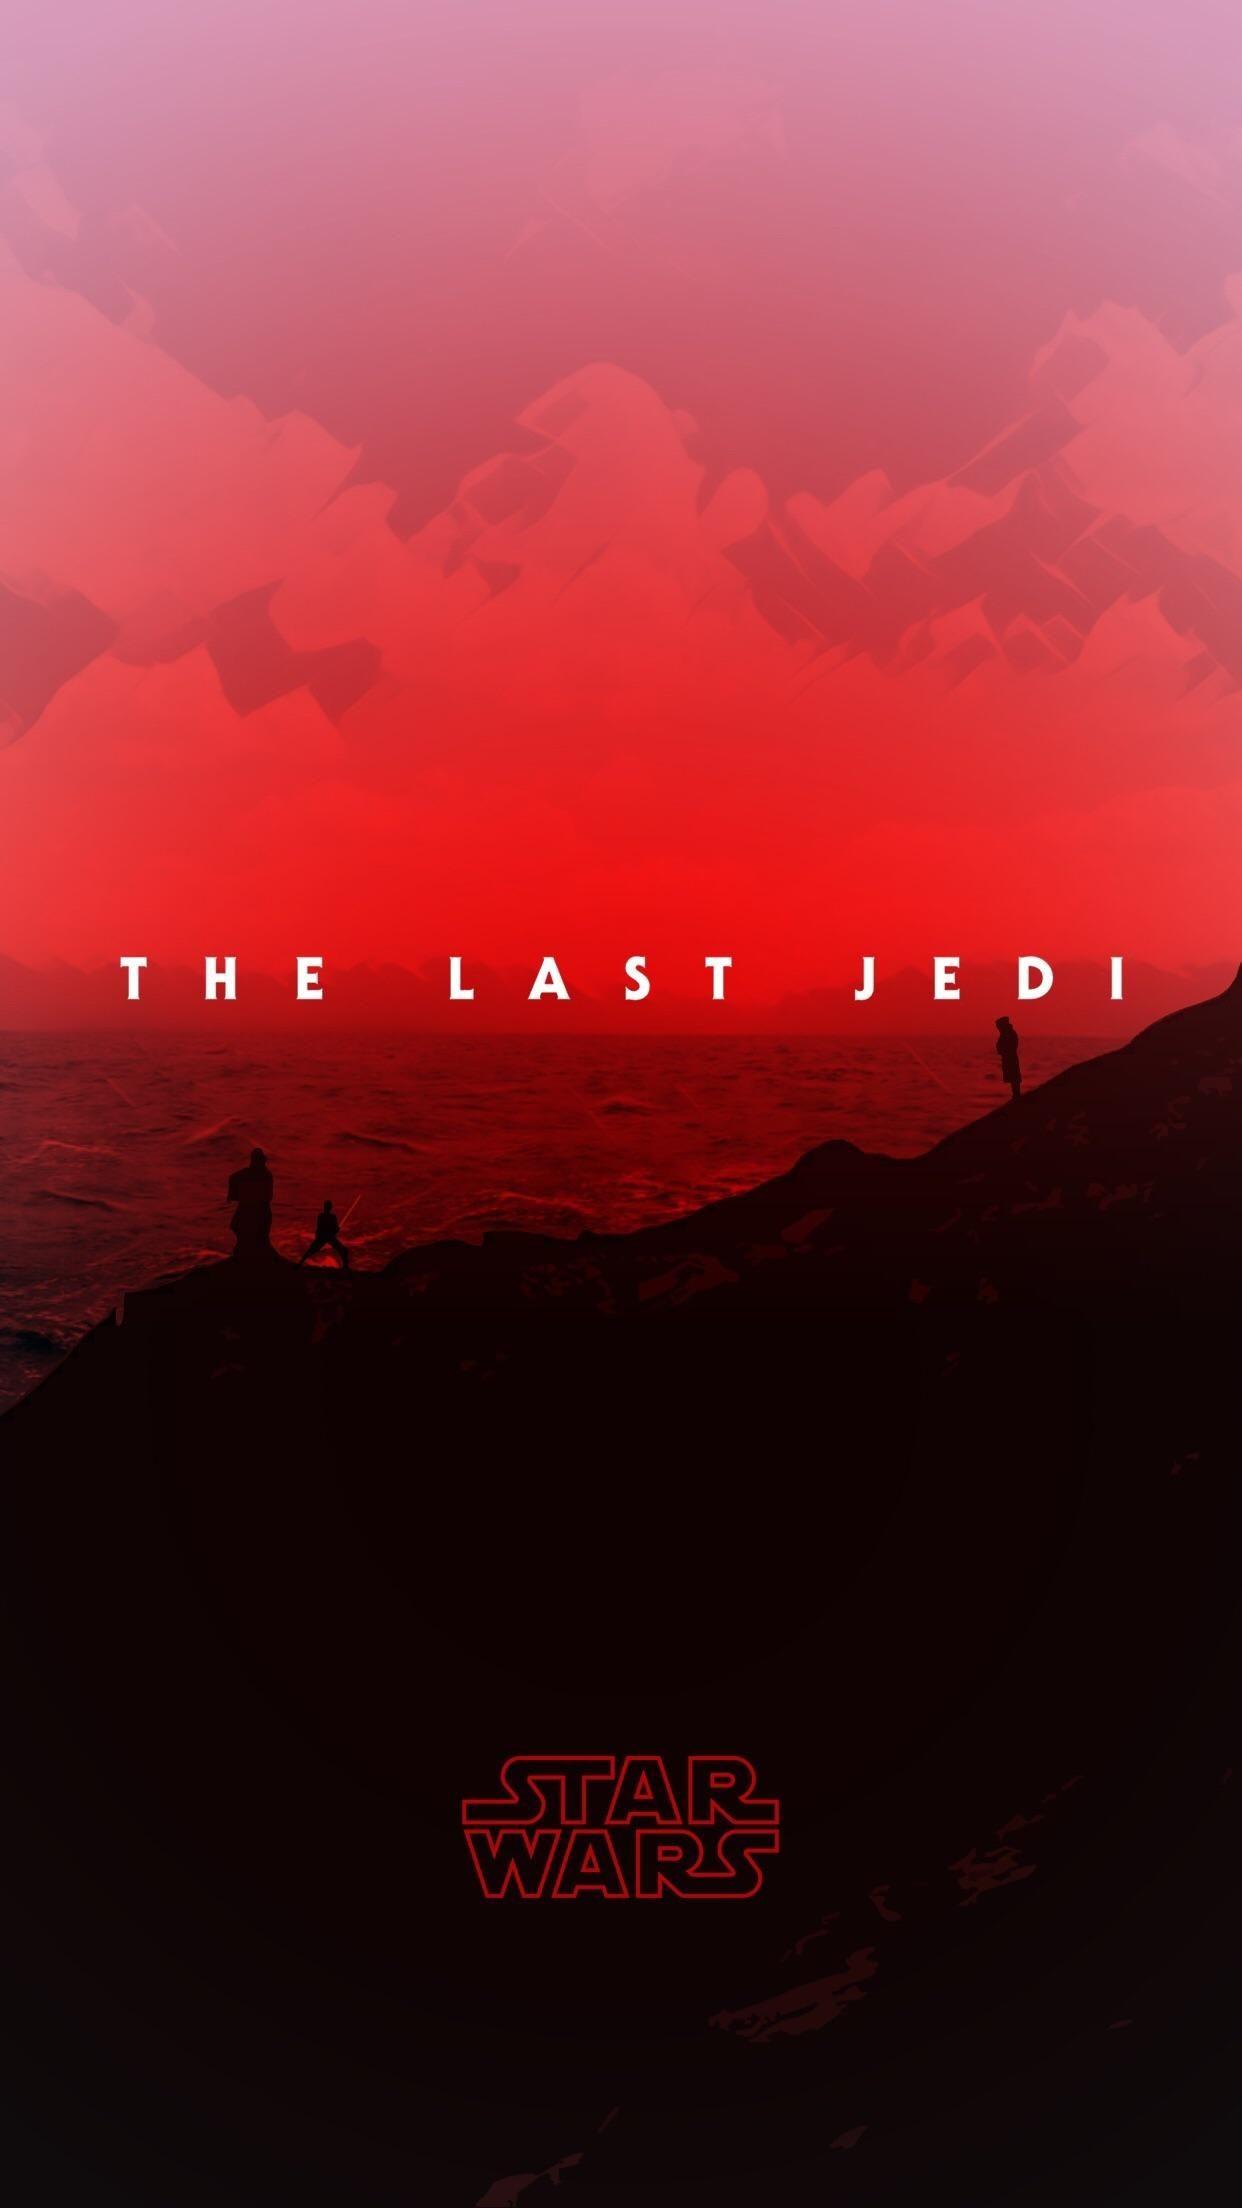 Res: 1242x2208, Star Wars: The Last Jedi (2017) HD Wallpaper From Gallsource.com